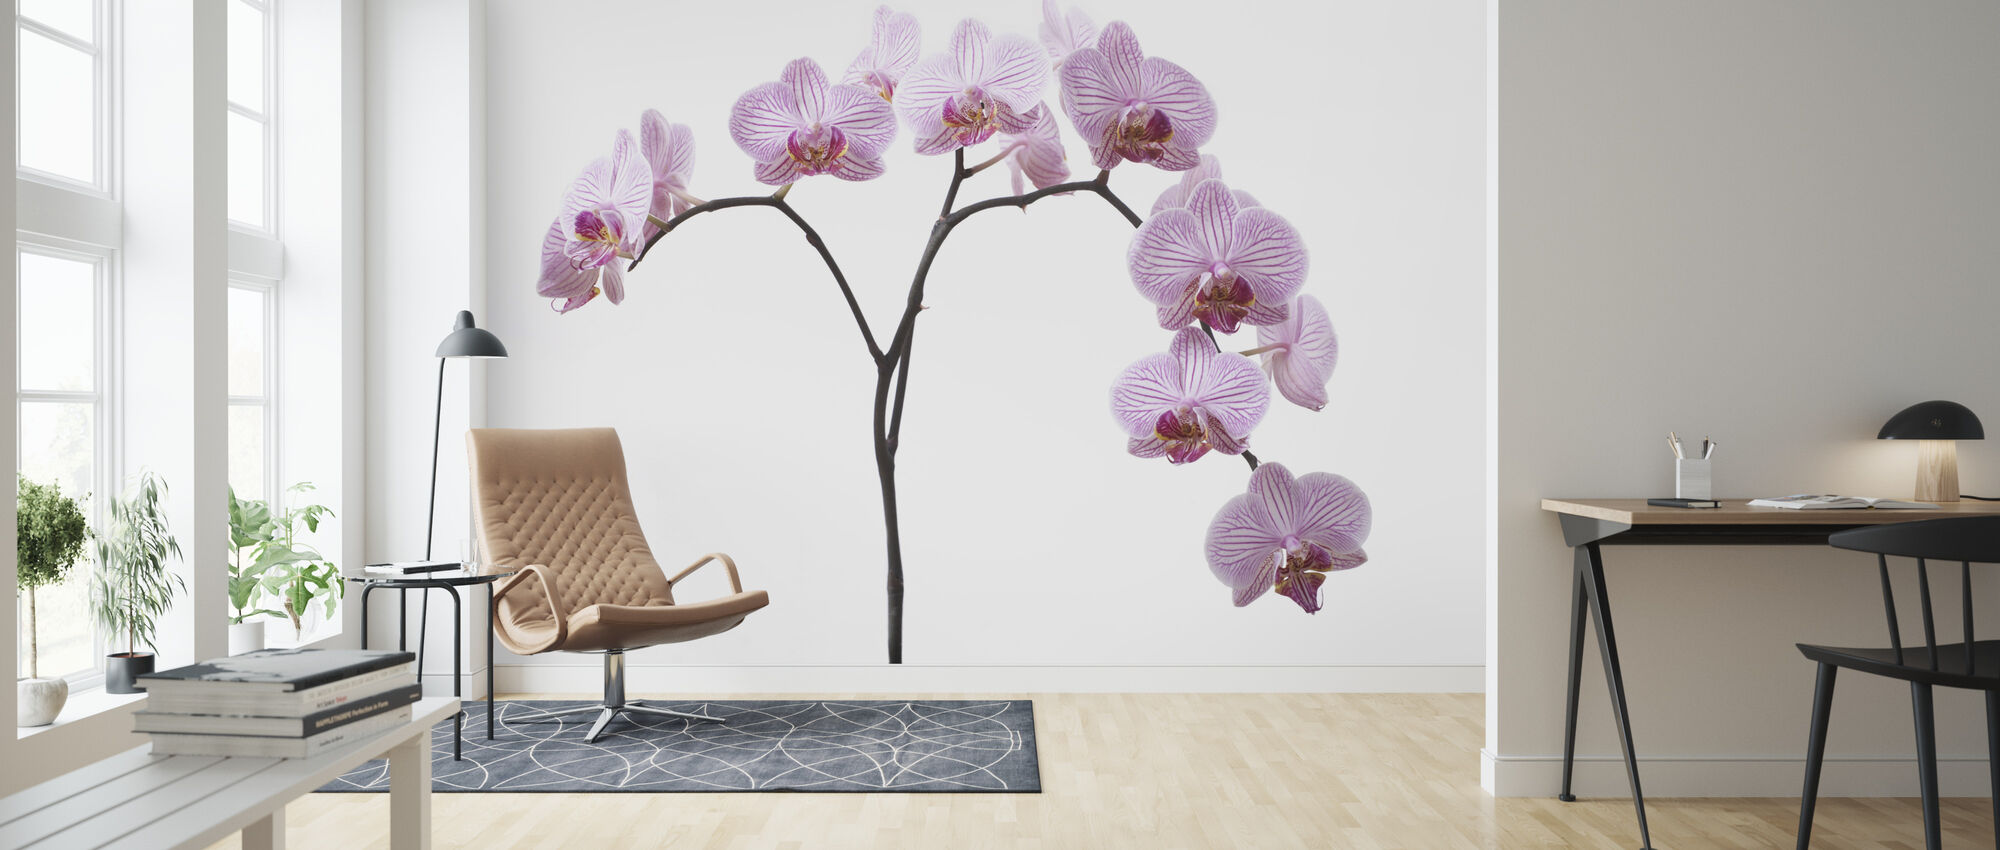 Pink Orchids - Wallpaper - Living Room